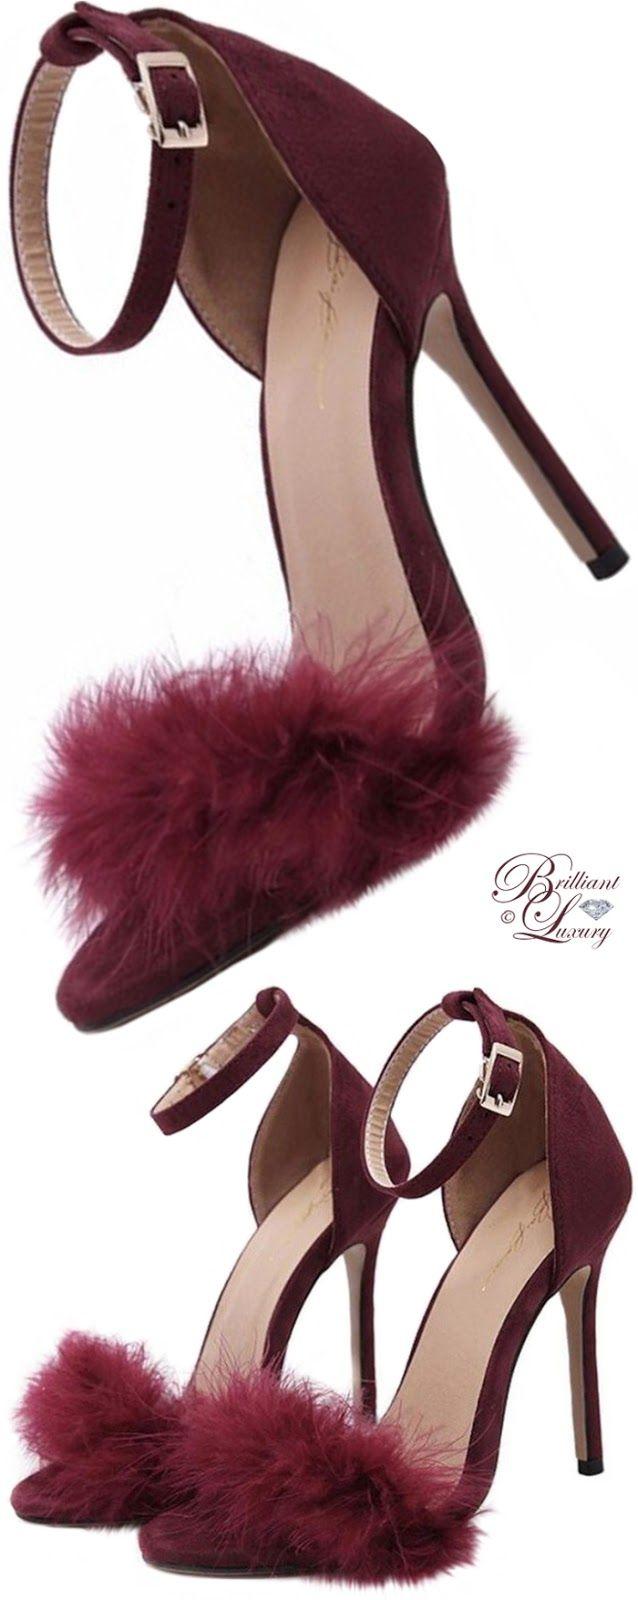 Brilliant Luxury by Emmy DE ♦ High Heel Stiletto